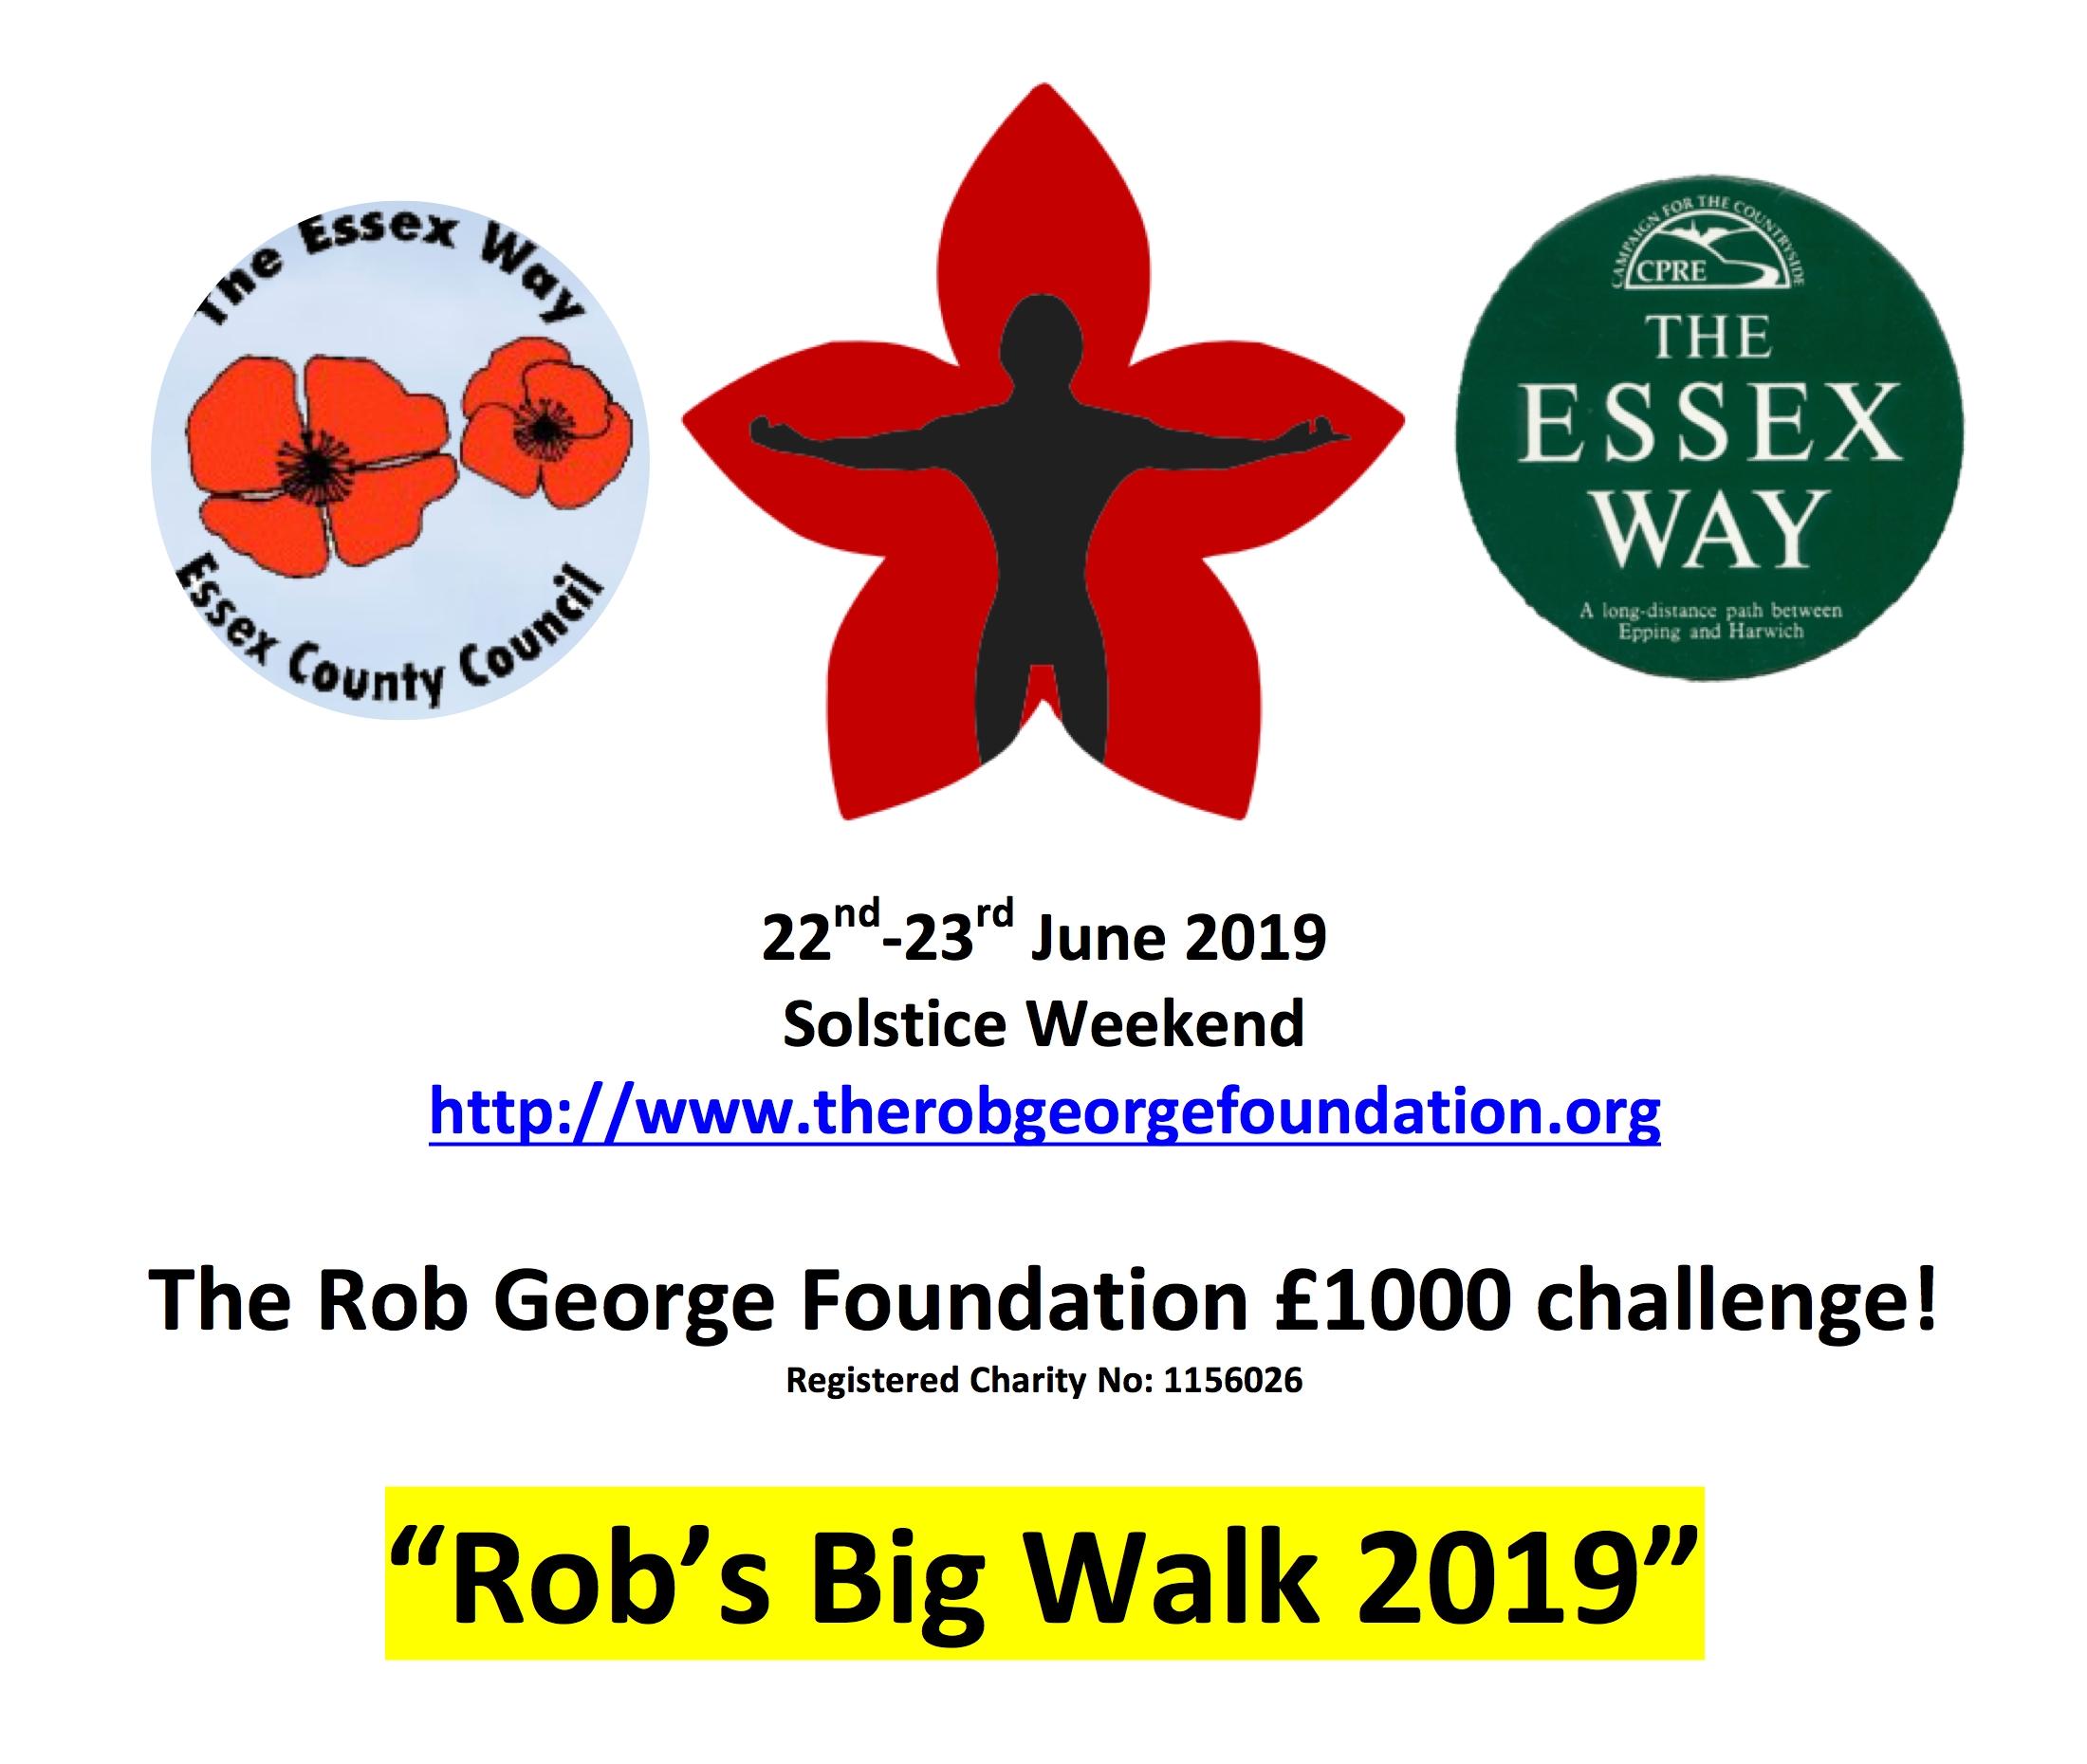 Rob's Big Walk'19